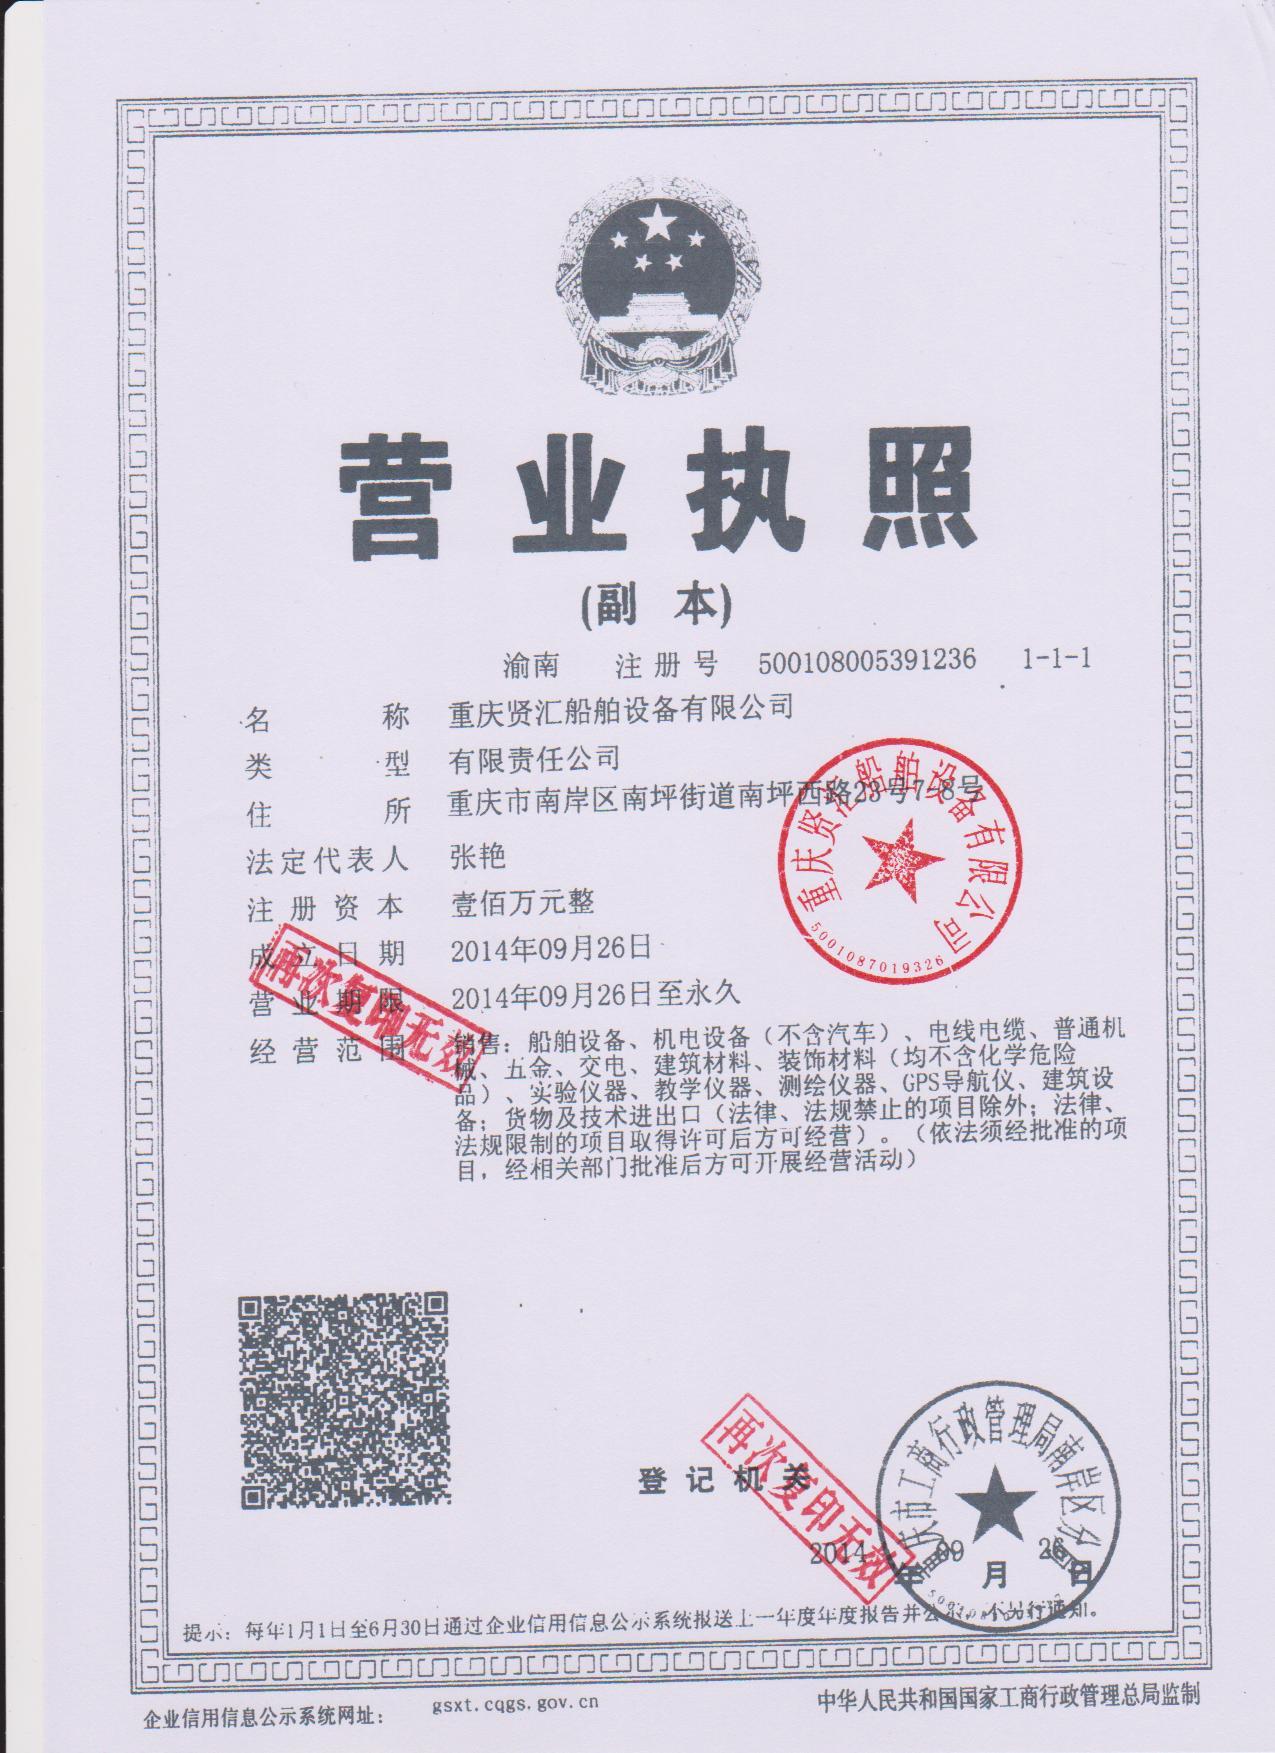 Chongqing Gathering Marine Equipment Co., Ltd License